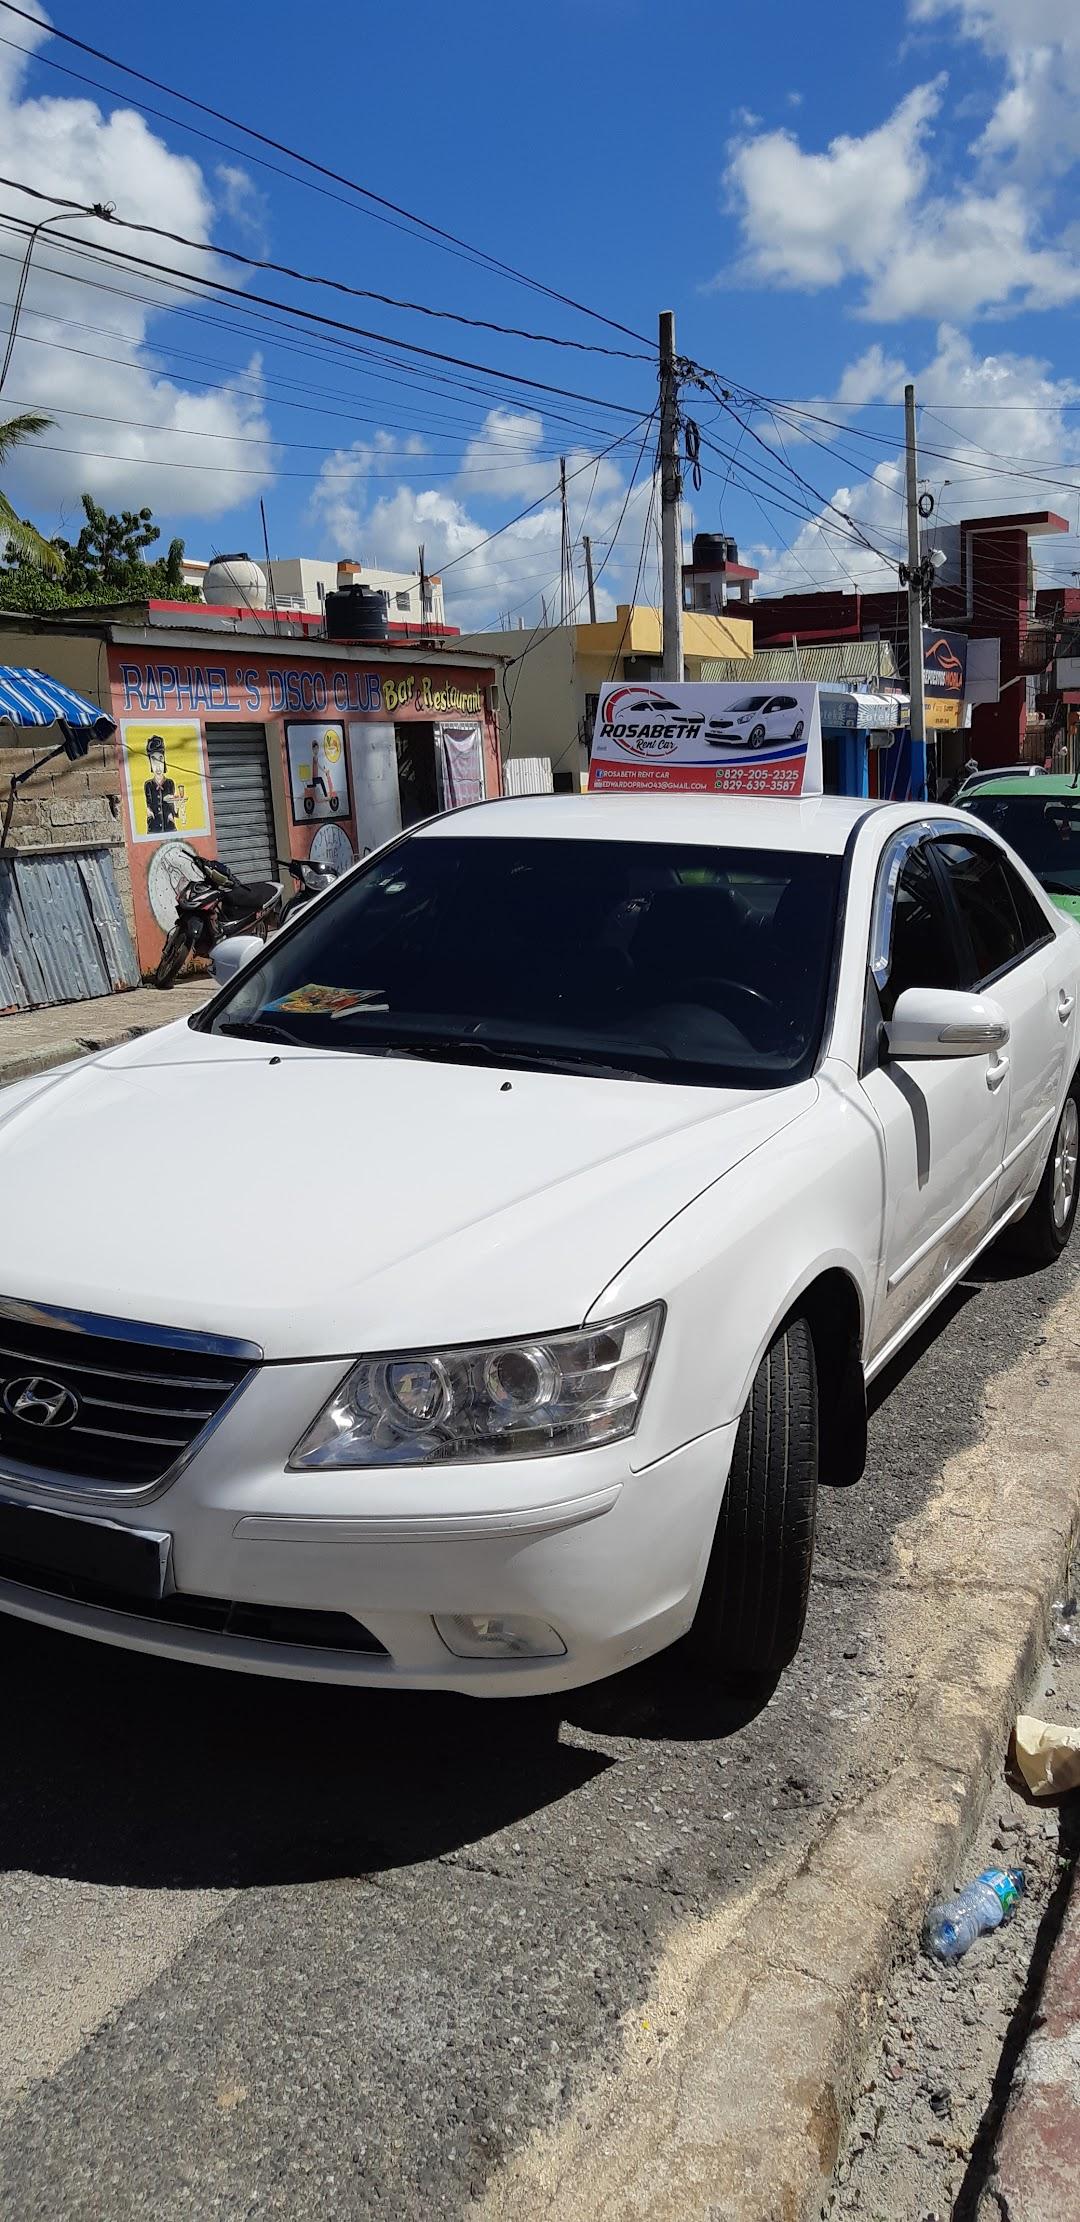 Rosabeth rent car